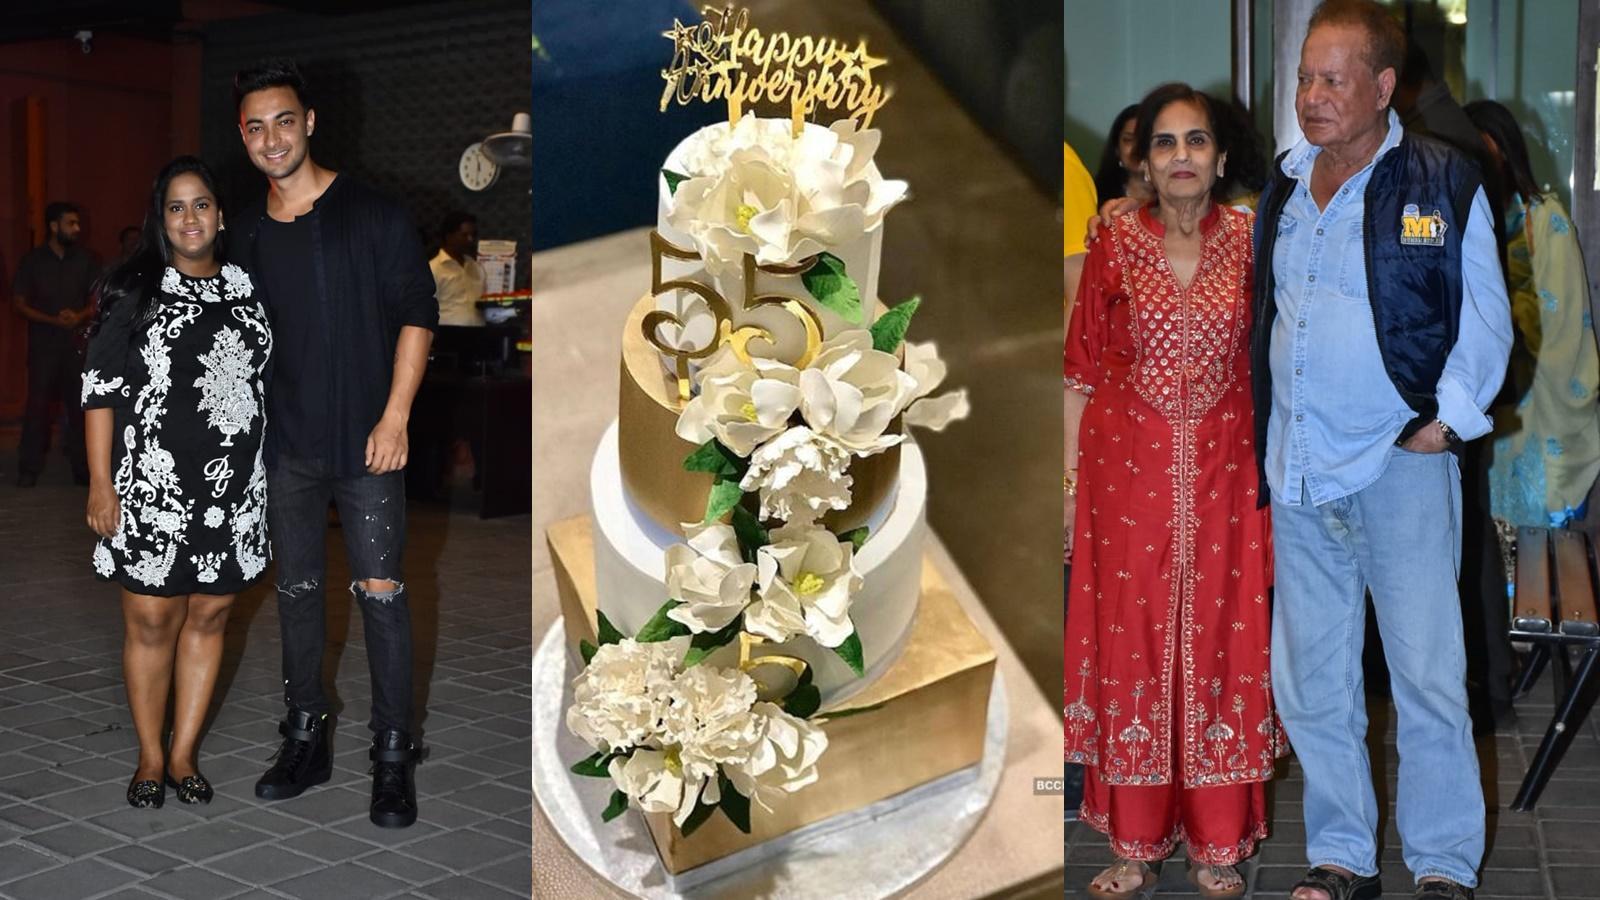 Aayush Sharma and Arpita Khan's wedding anniversary party: Katrina Kaif, Salman Khan, and other celebs attend the bash